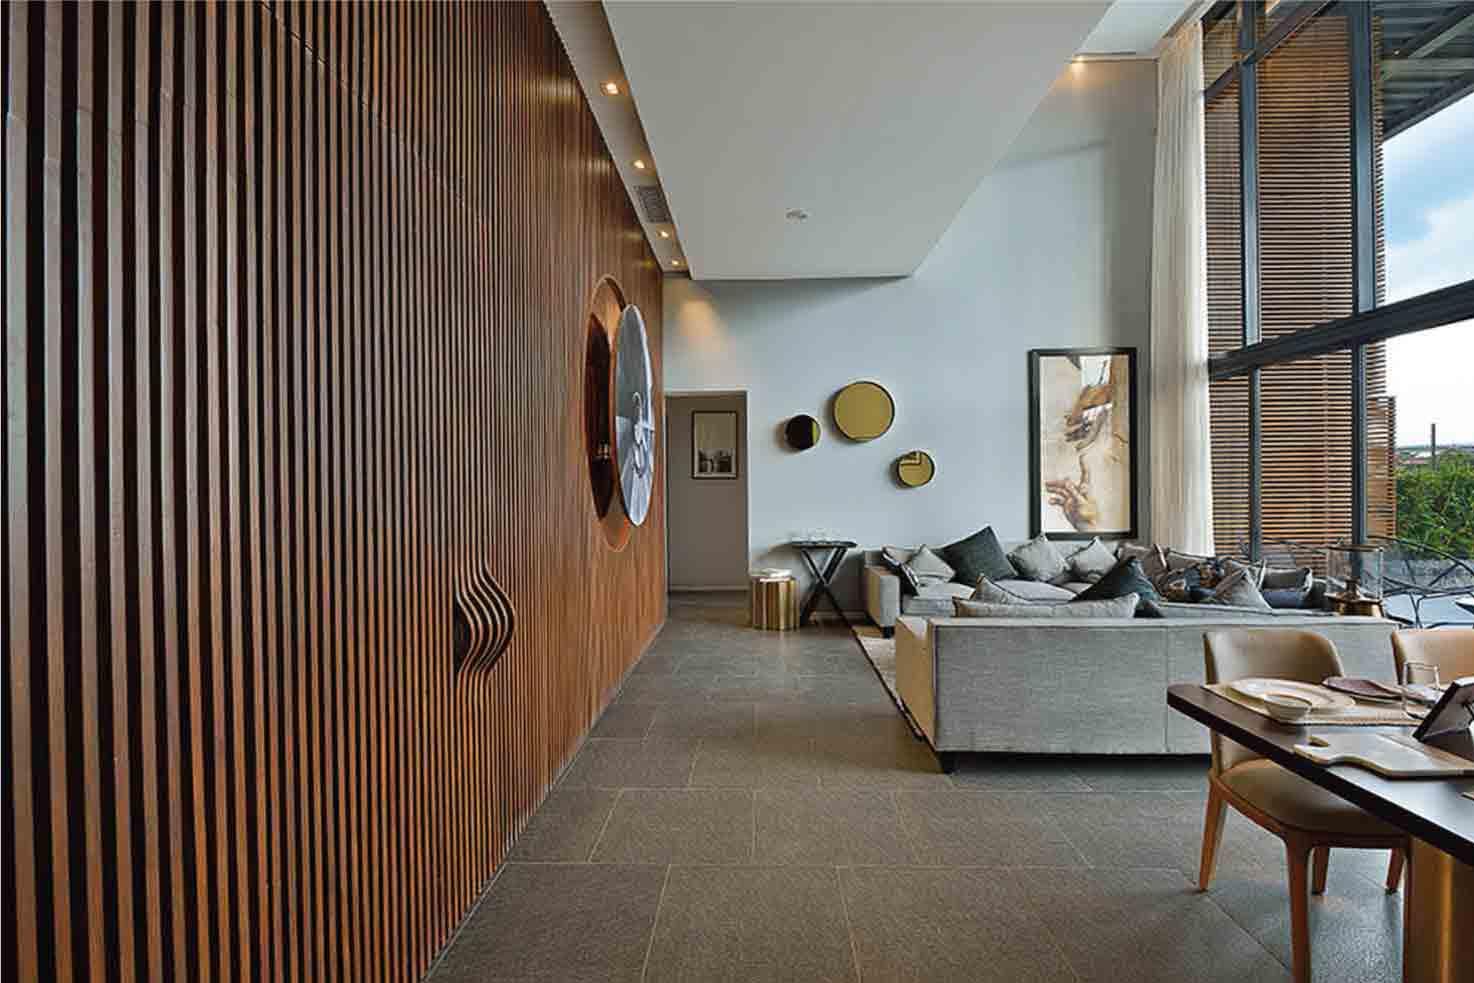 Luxury Duplex on EM Bypass